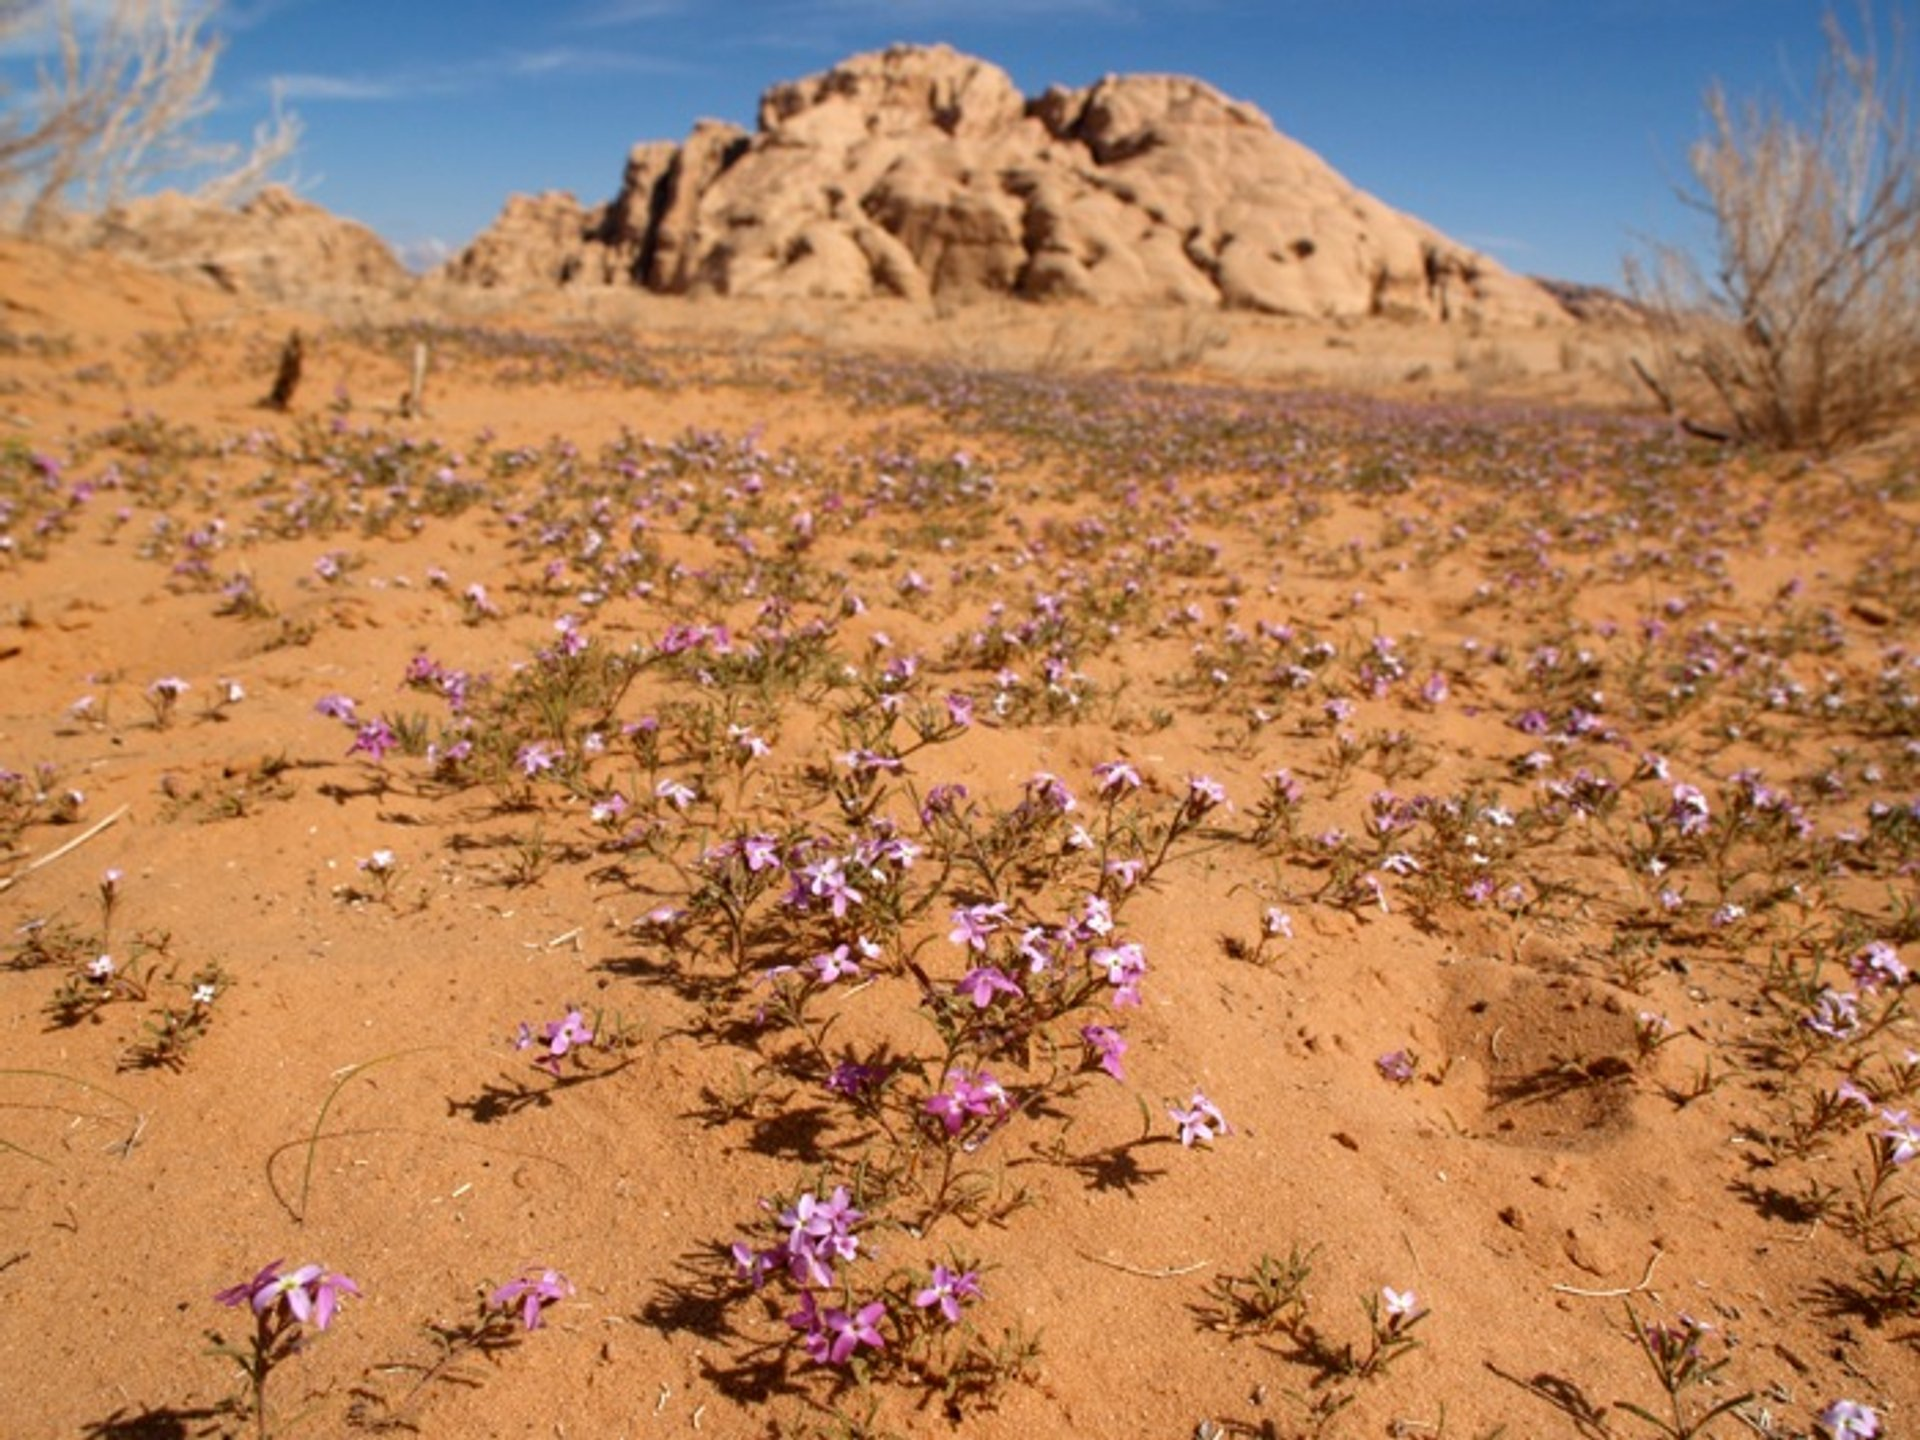 Wadi Rum Desert in Bloom in Jordan - Best Time